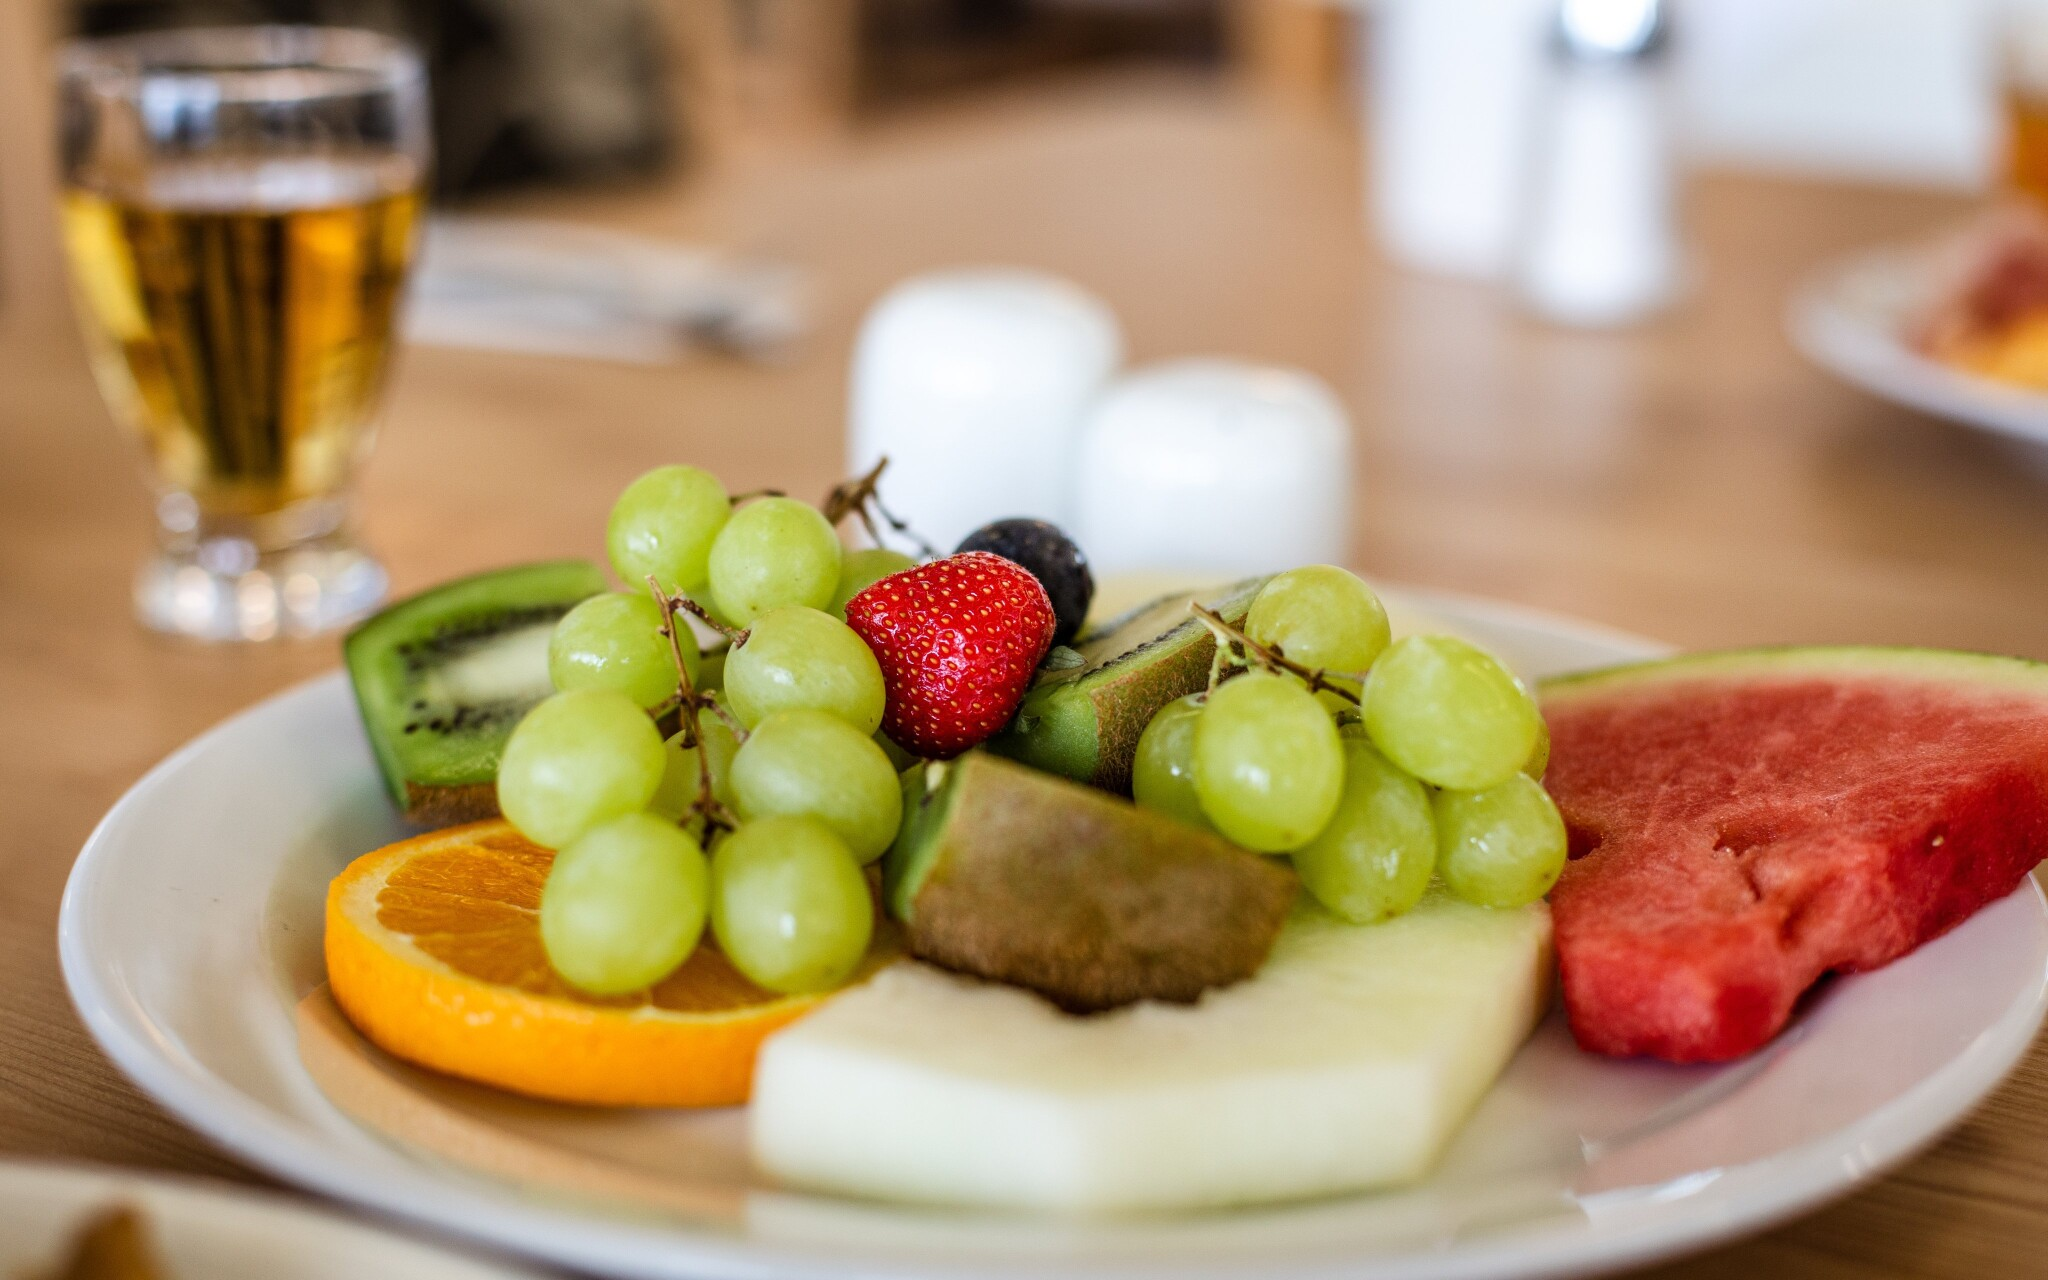 Polpenzia, reštaurácia, Sporthotel am Semmering ***, Rakúsko